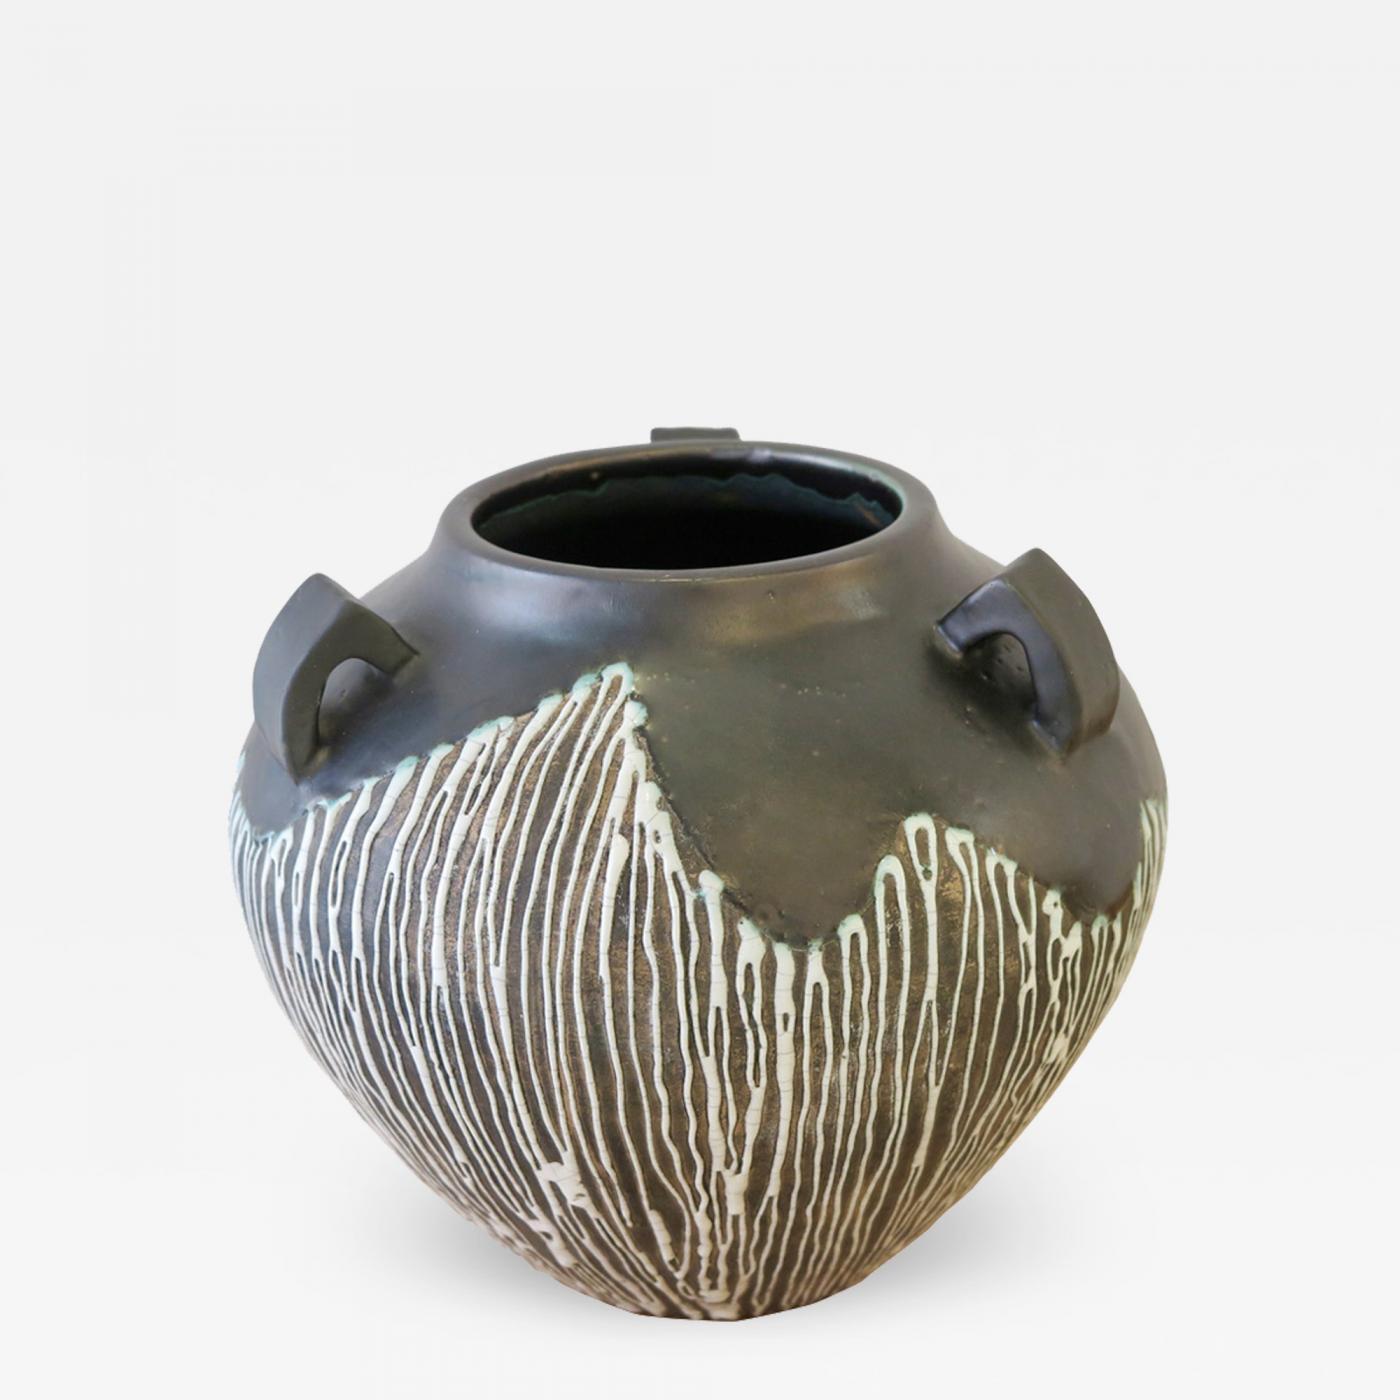 Felix gete primavera ceramic vase listings decorative arts objects vases jars urns reviewsmspy